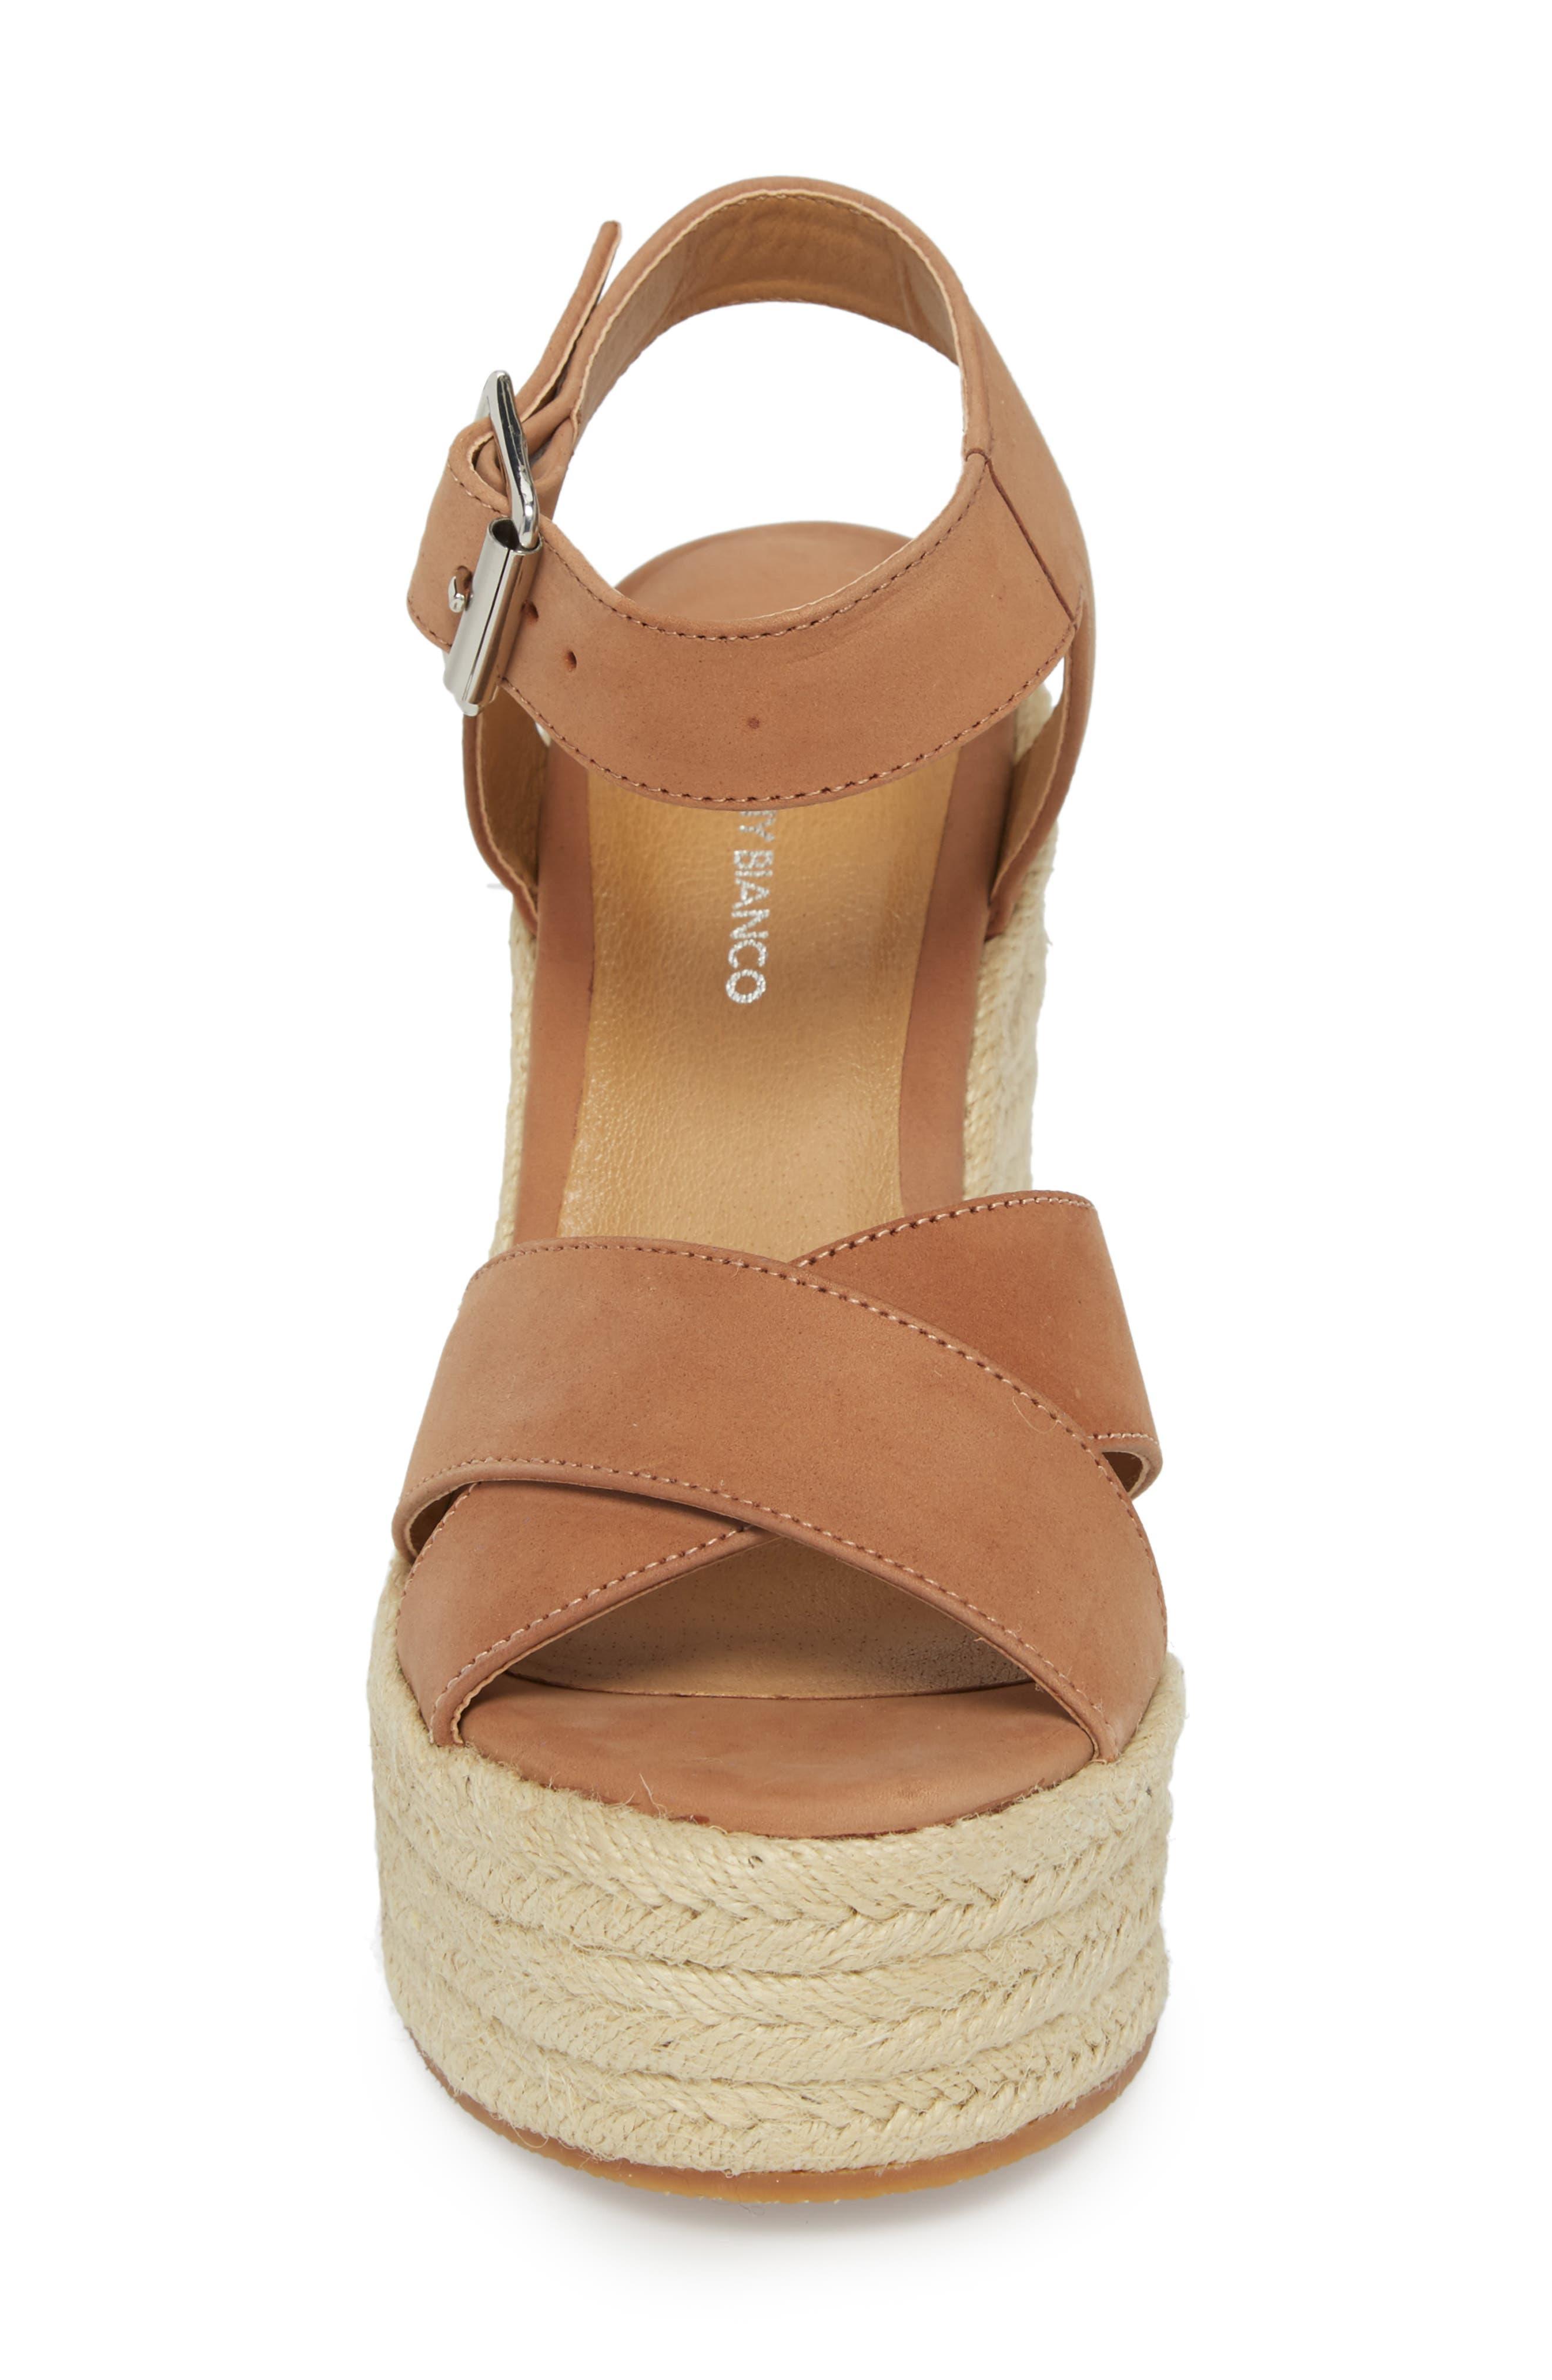 Boston Espadrille Wedge Sandal,                             Alternate thumbnail 4, color,                             Caramel Phoenix Leather